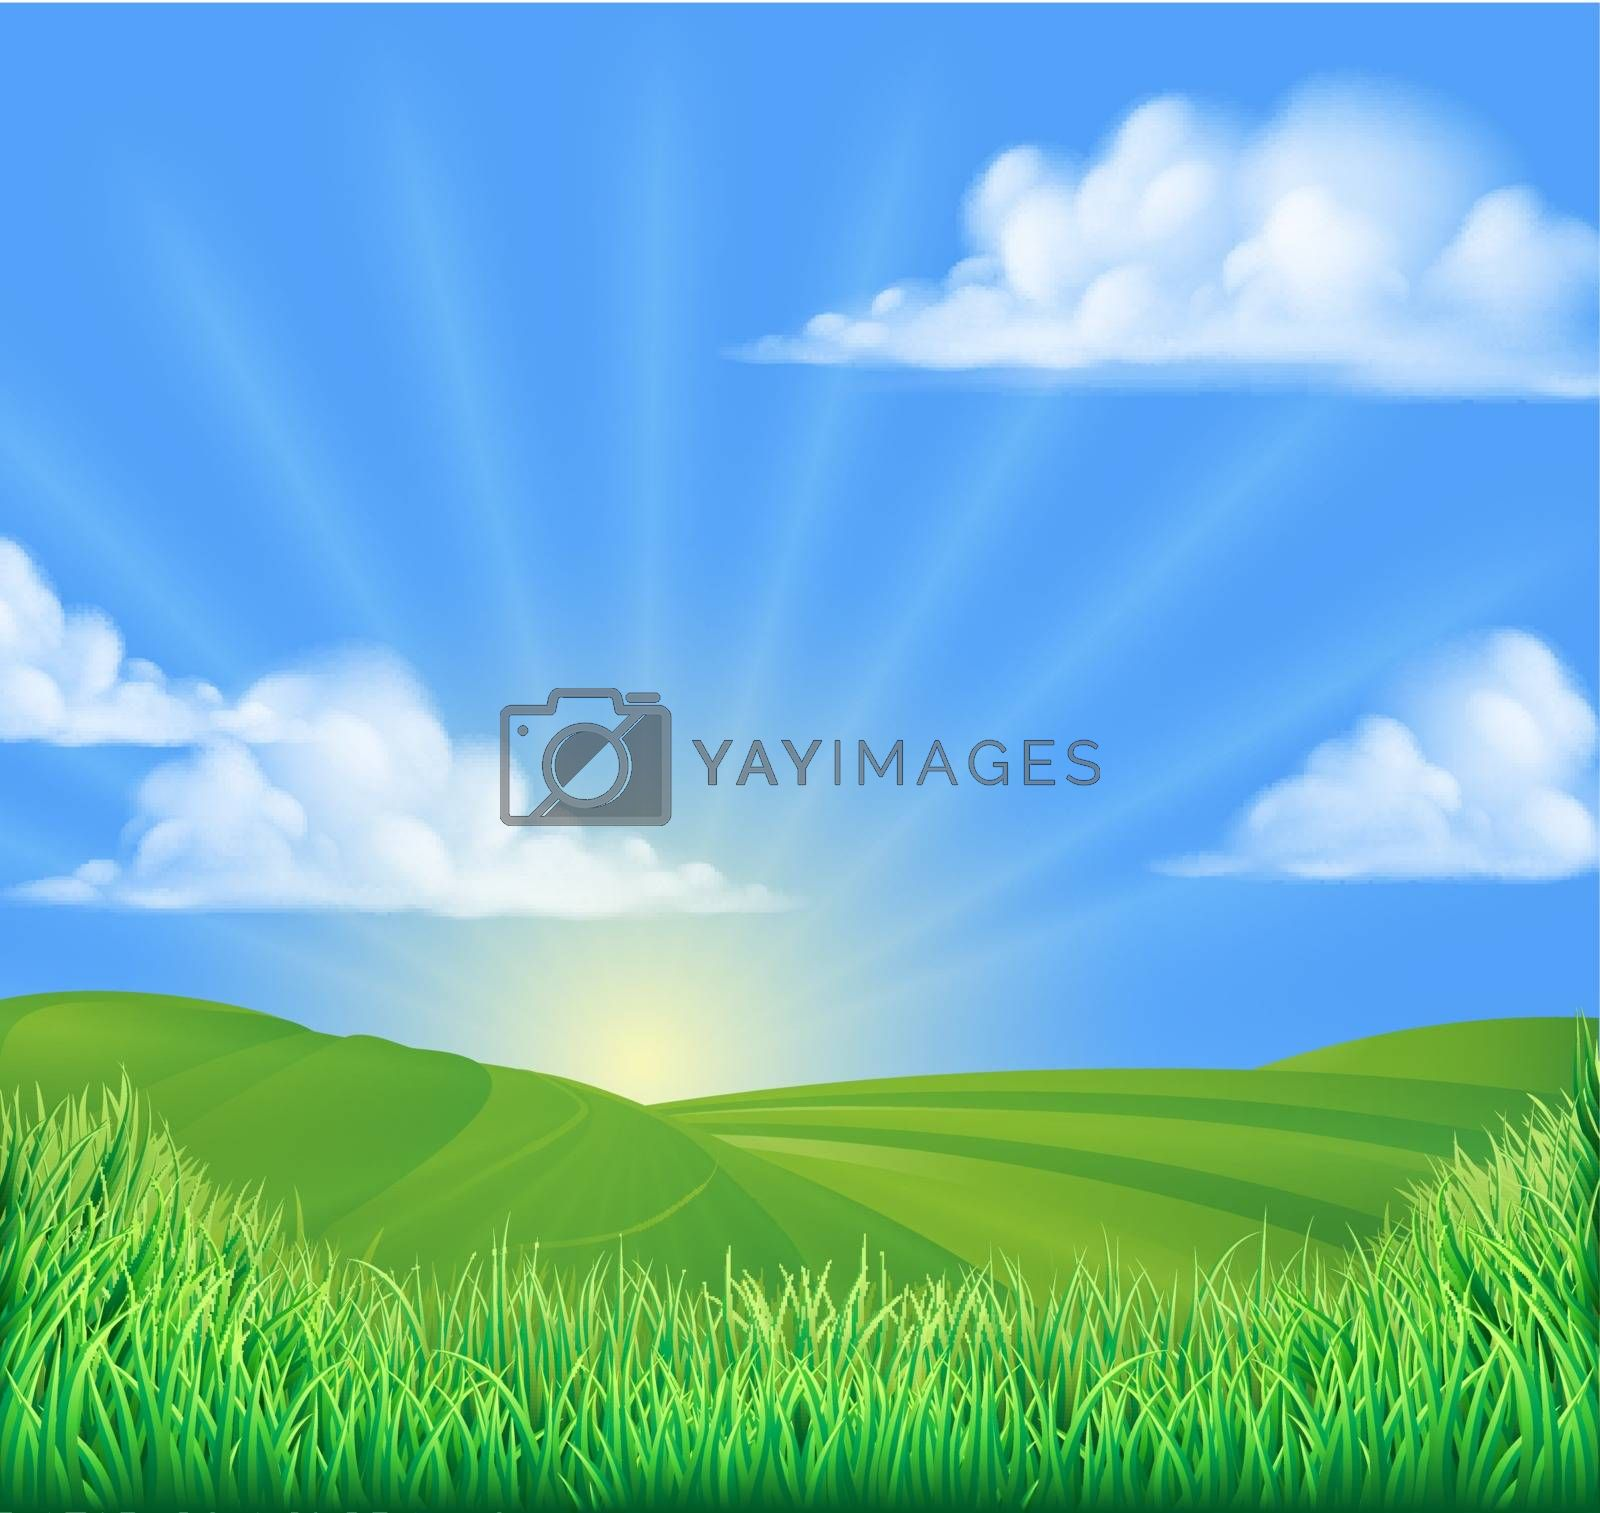 A rolling hills field sun background landcape illustration